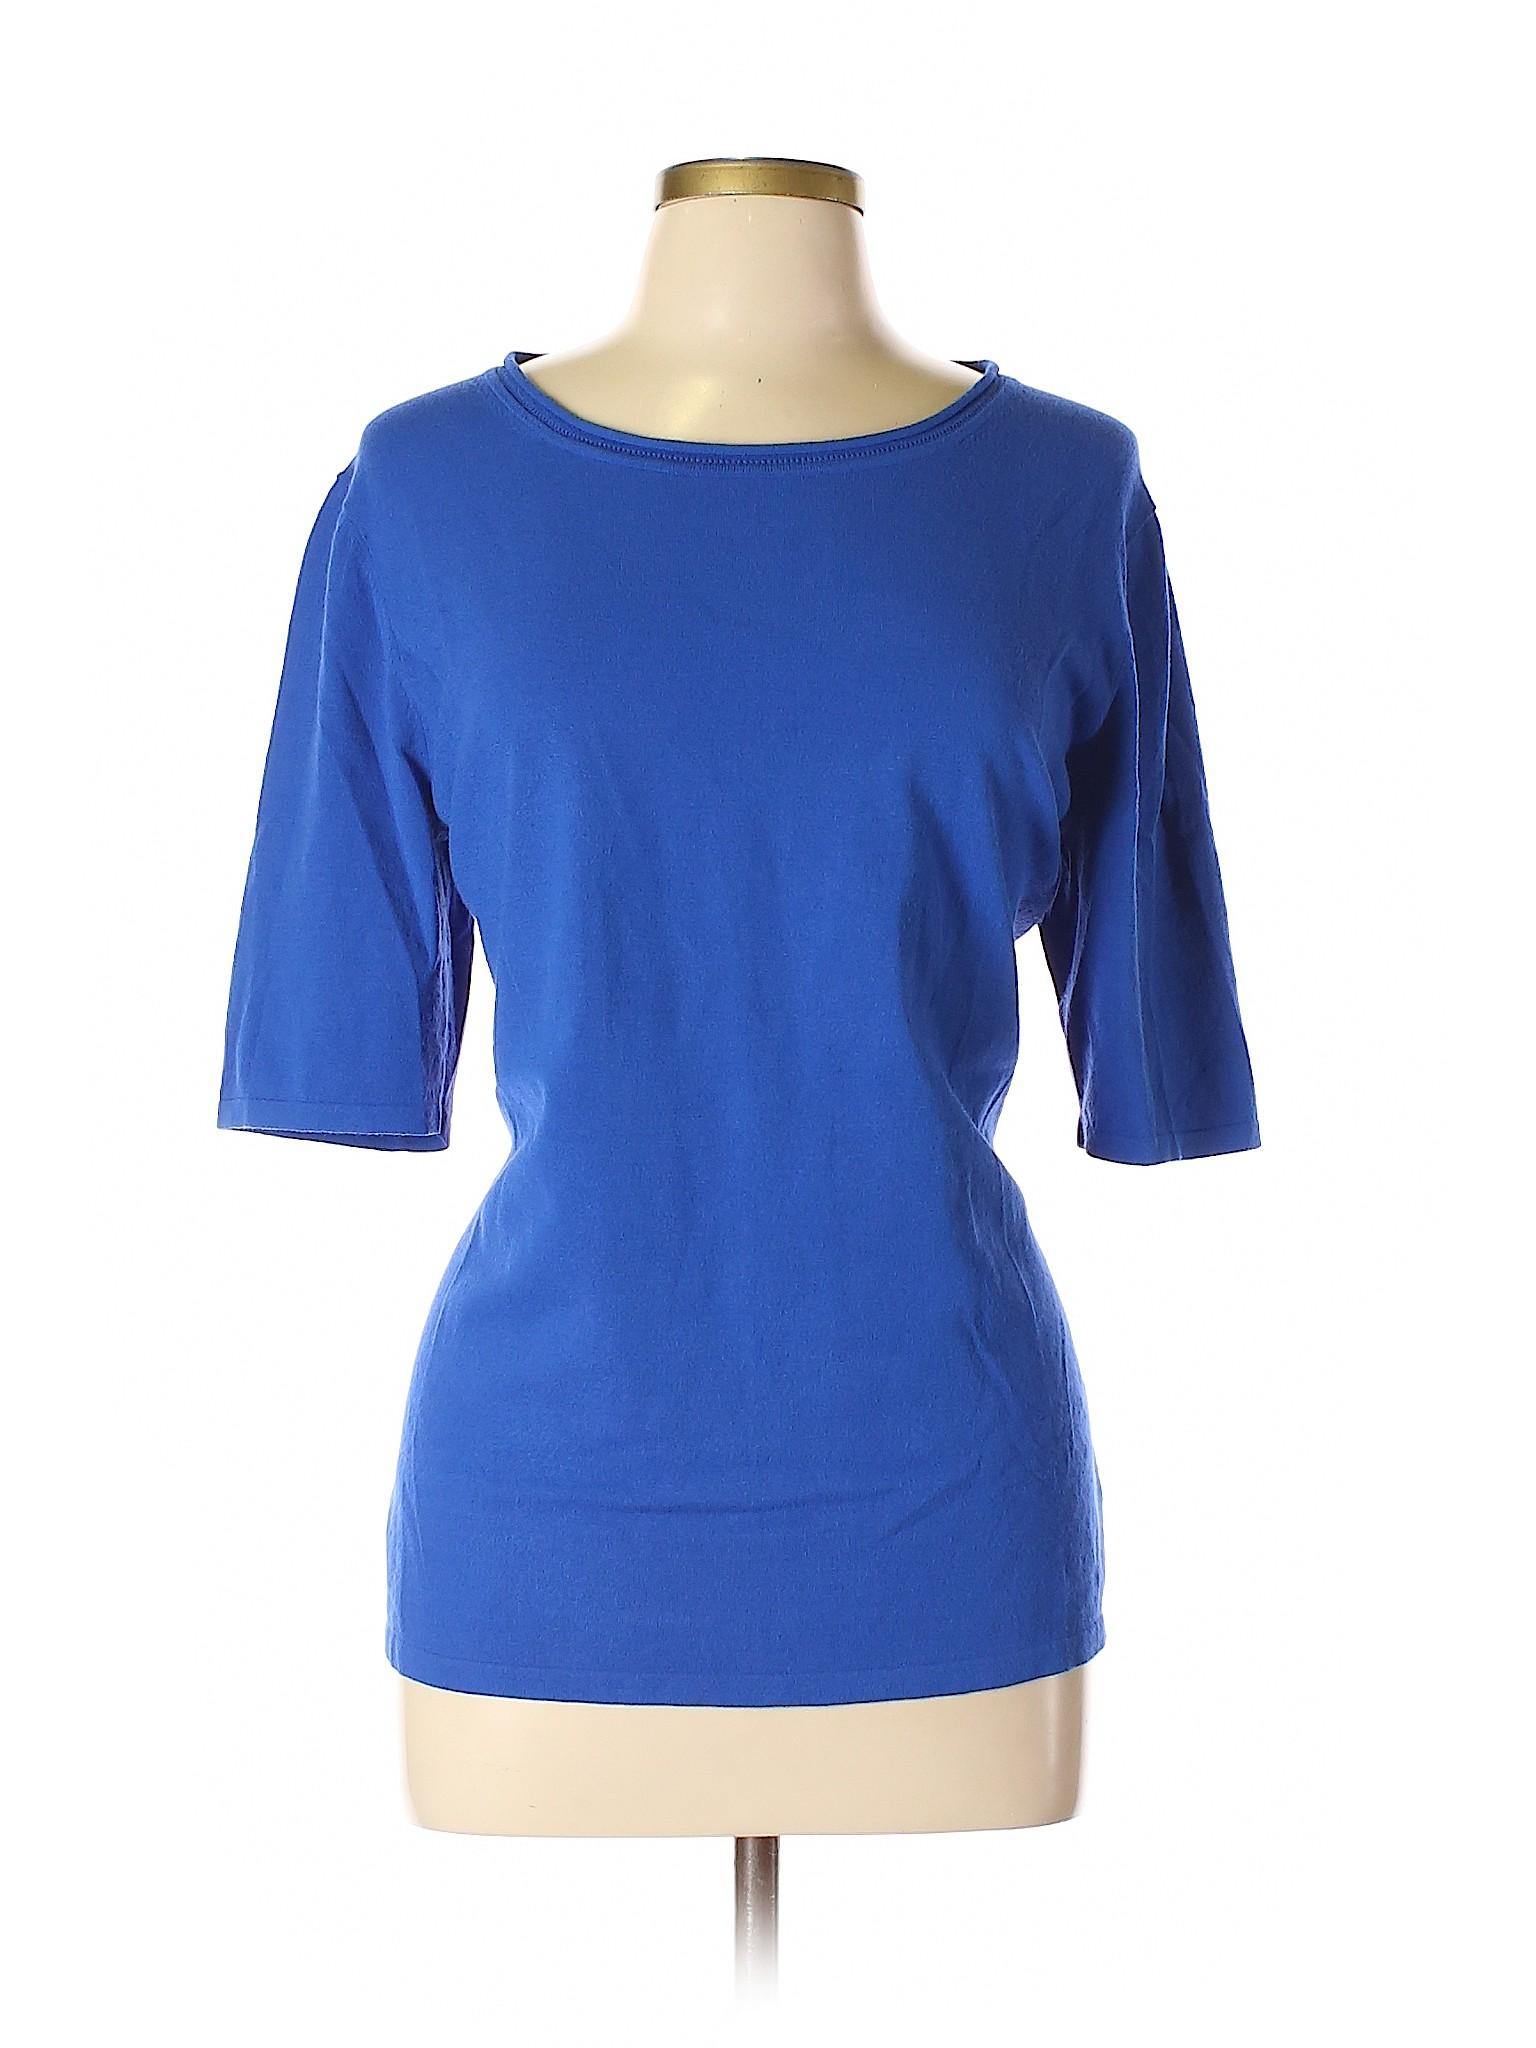 winter Pullover Sweater New Lafayette 148 Boutique York d8cwqPXvdx